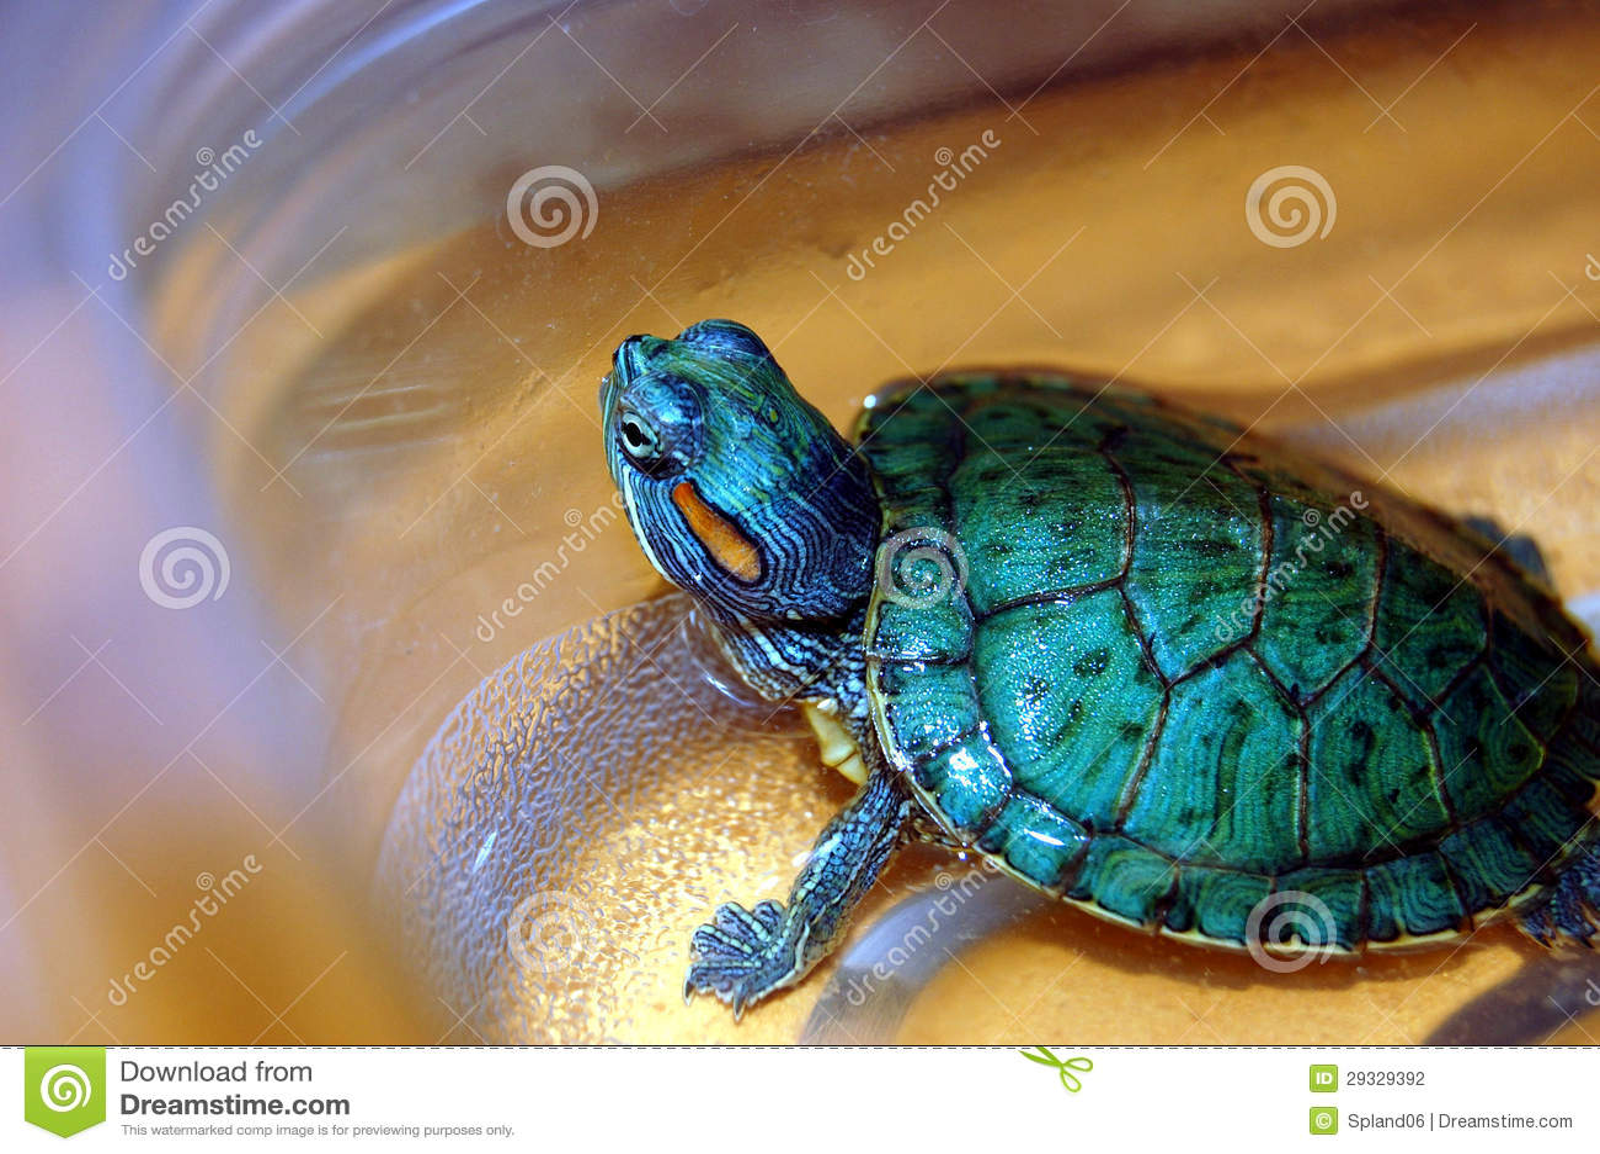 Hobby Pet Turtle Stock Photography - Image: 29329392